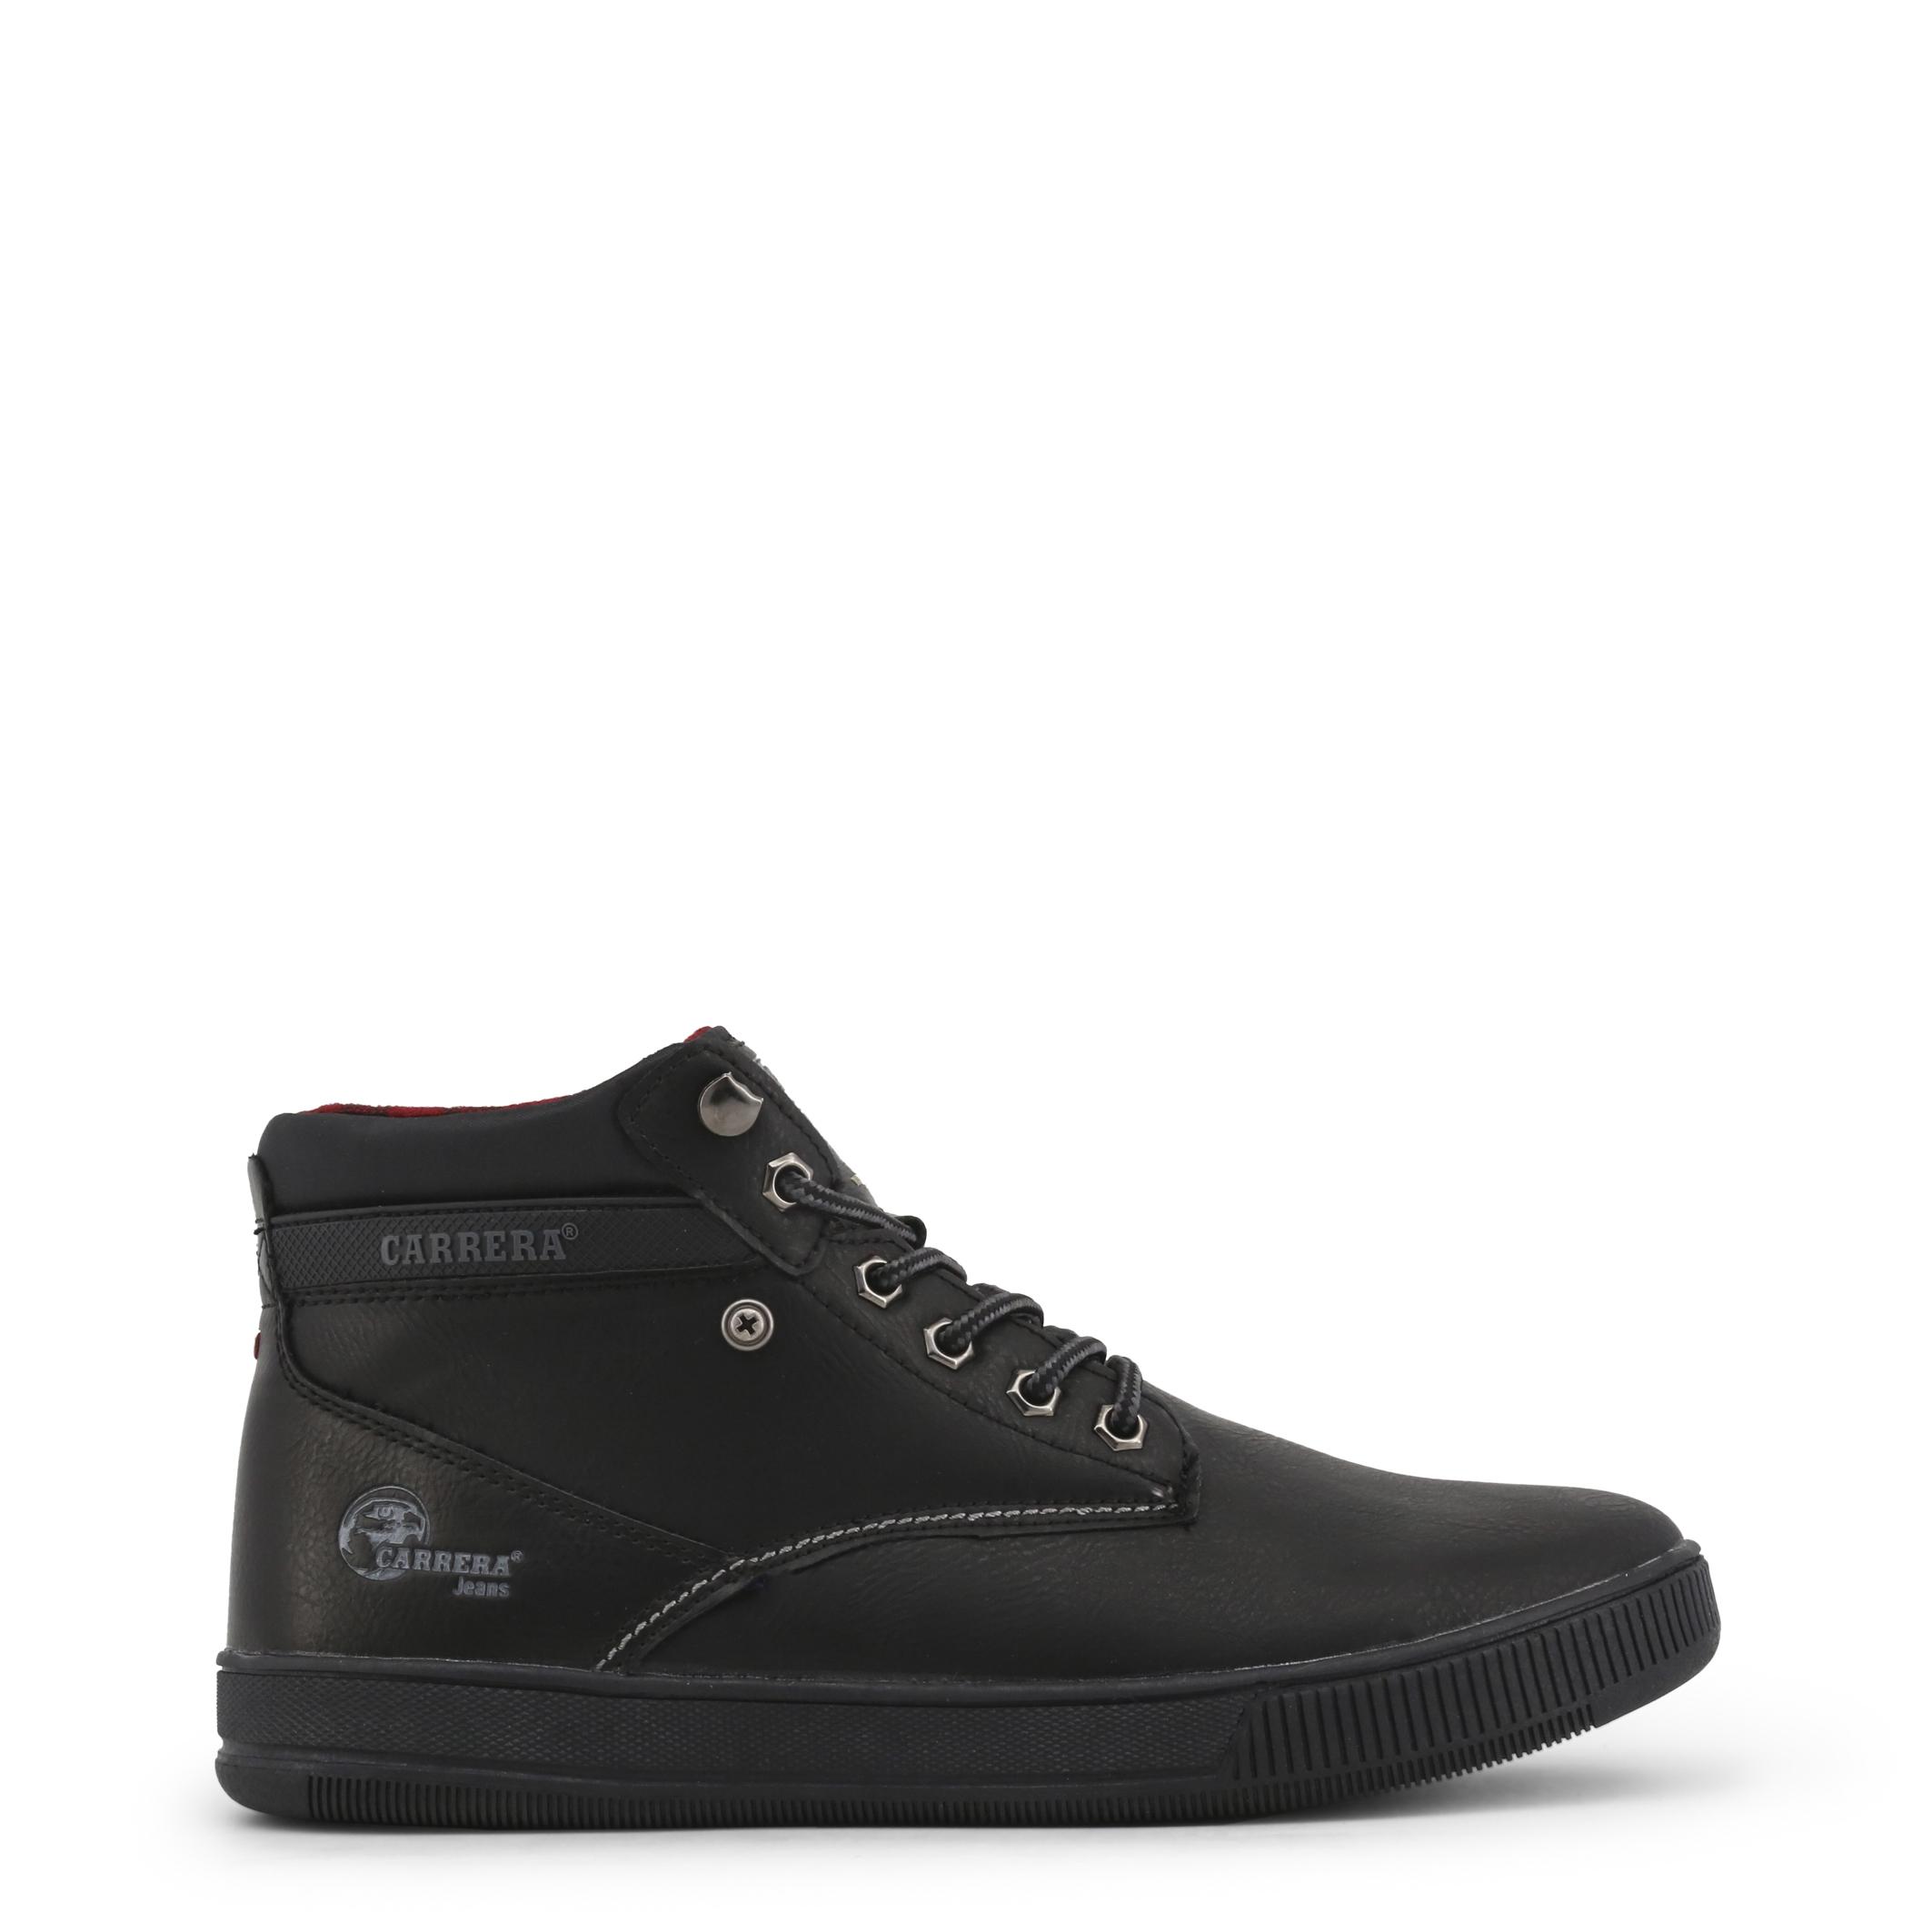 Carrera Jeans CAM825001 Uomo Nero 94258